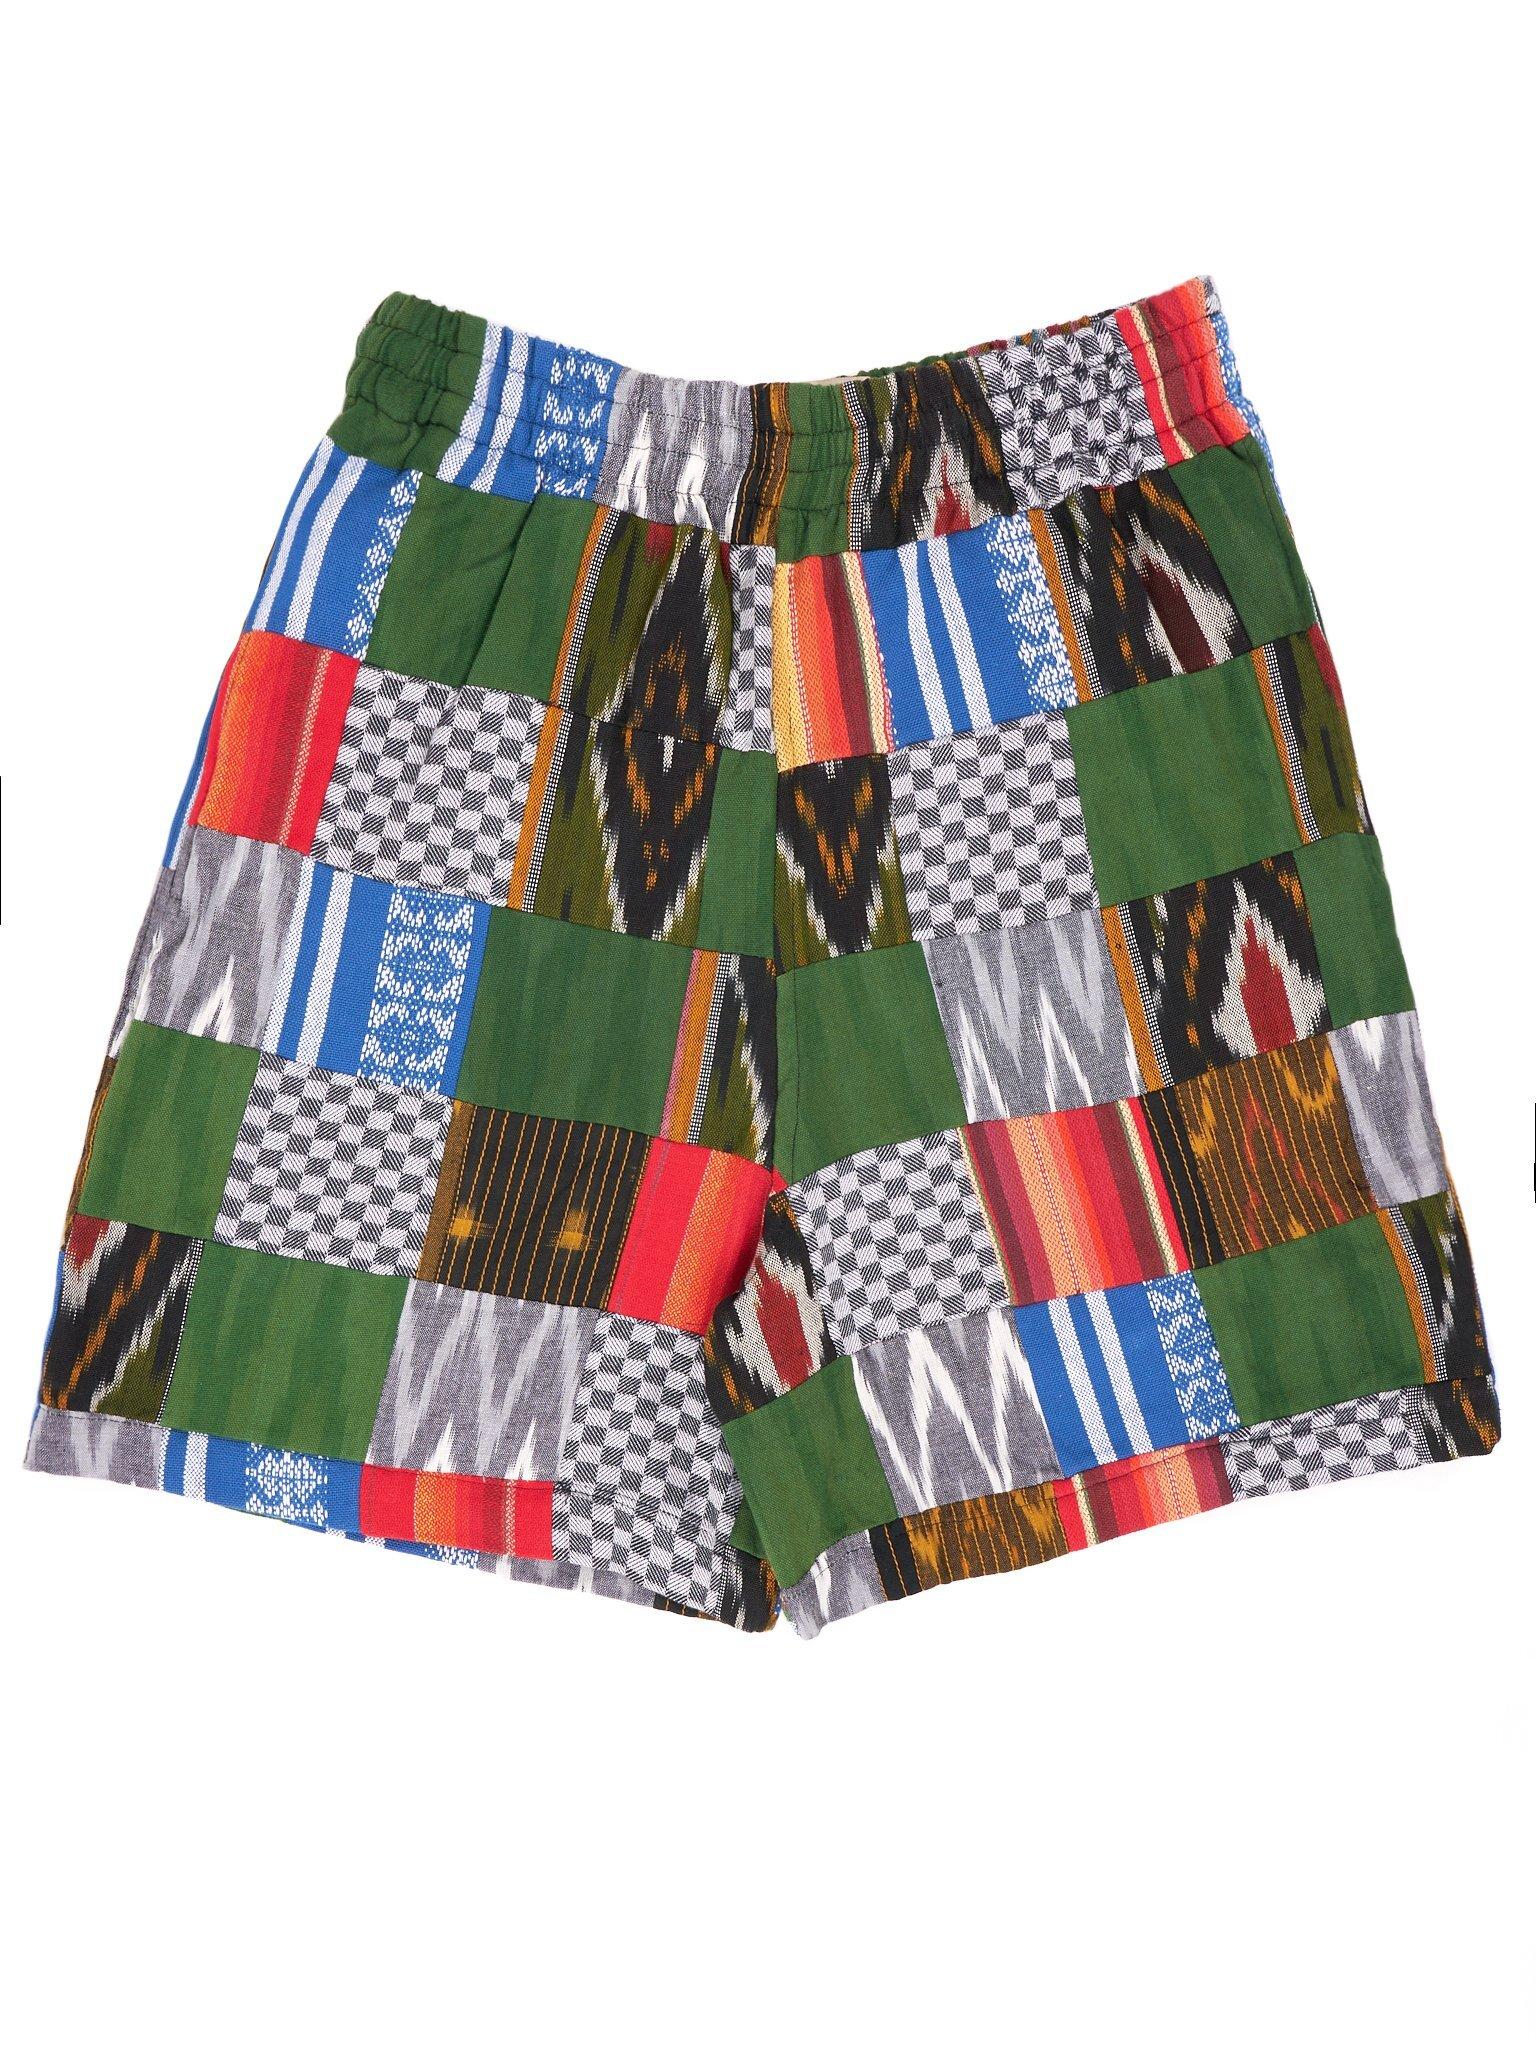 ENSÉ Patchwork Shorts1.jpg